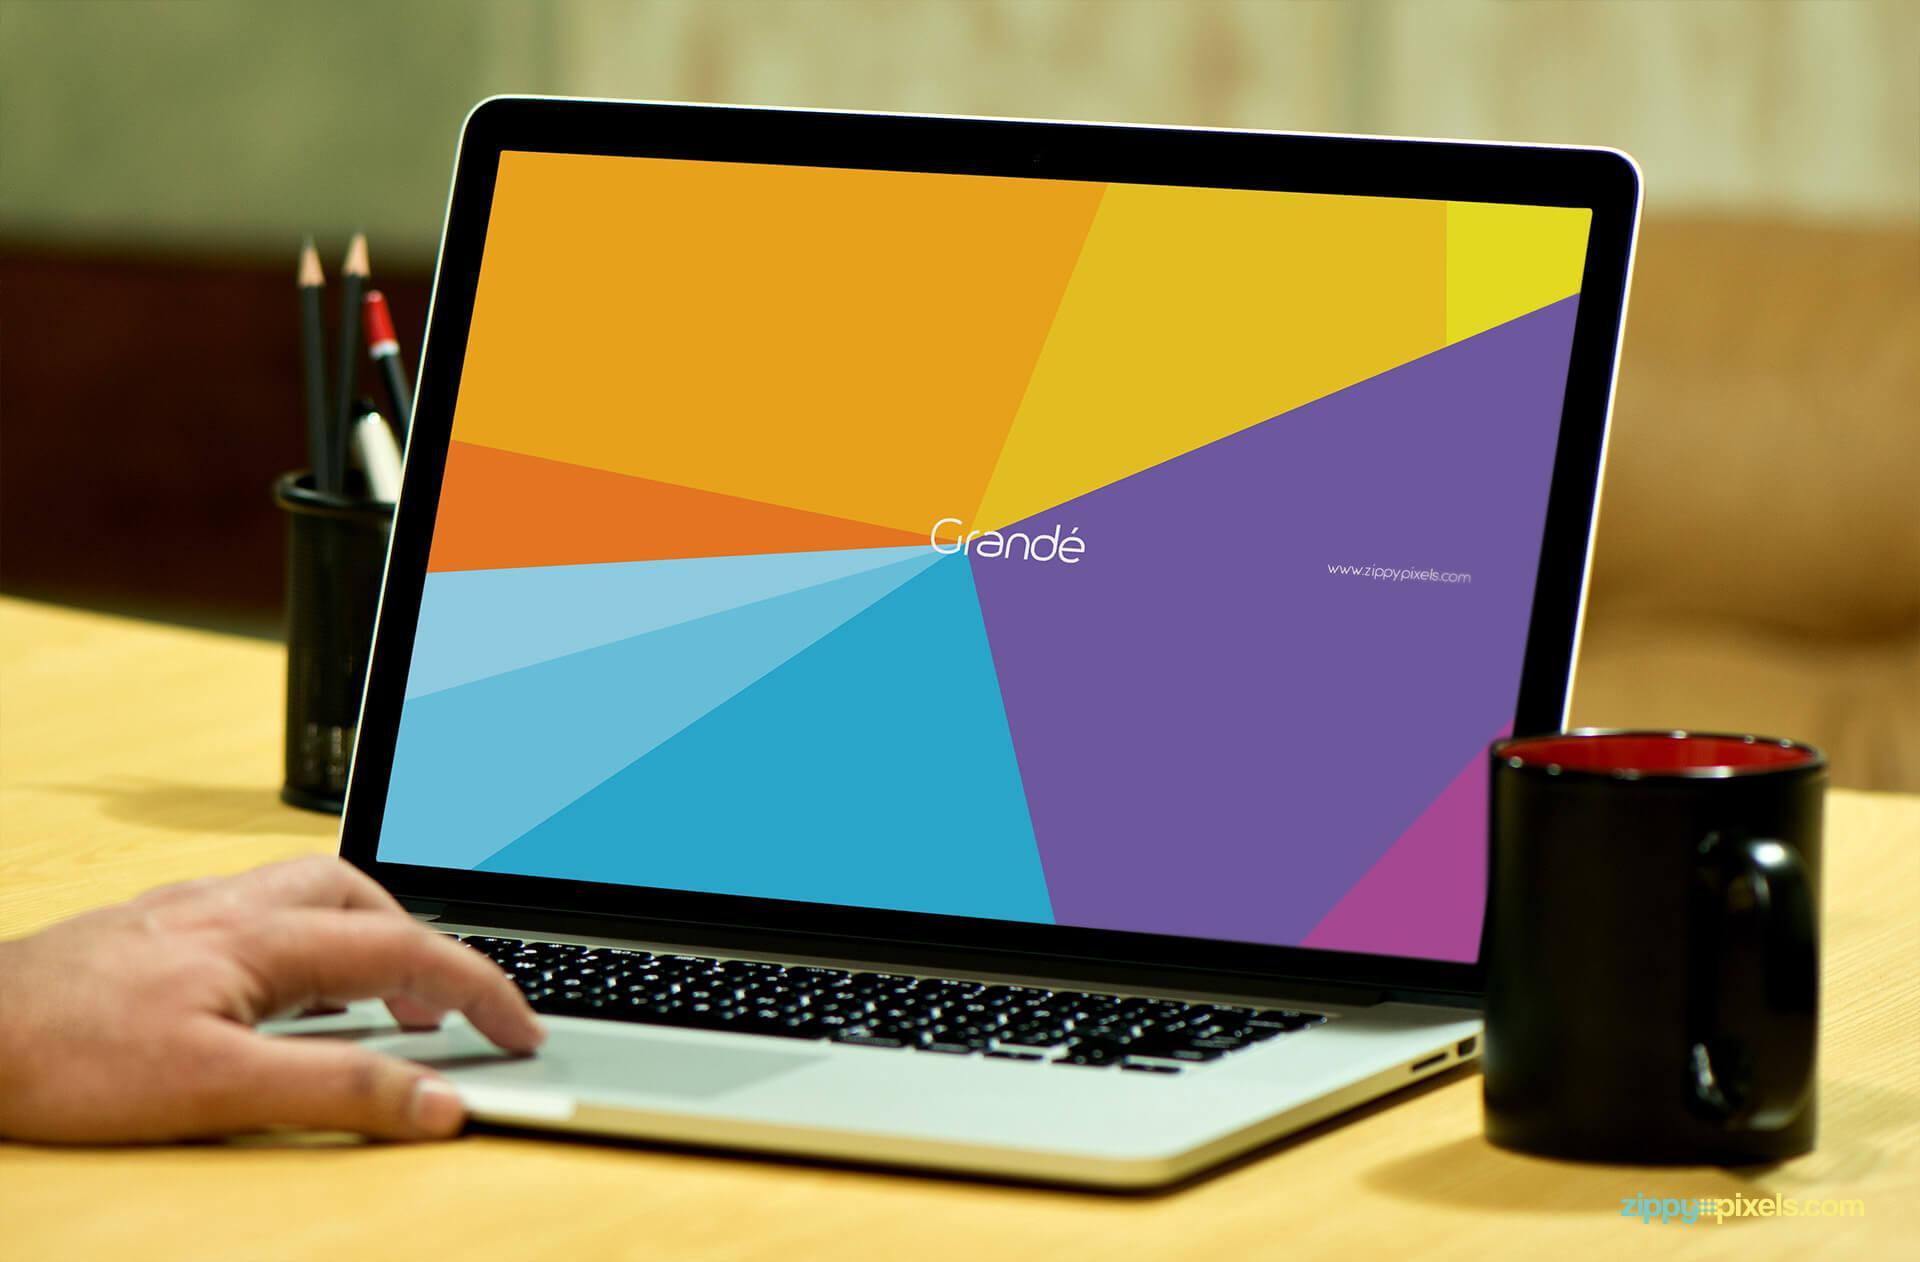 Device Mockup of Macbook Pro on Table with Coffee Mug